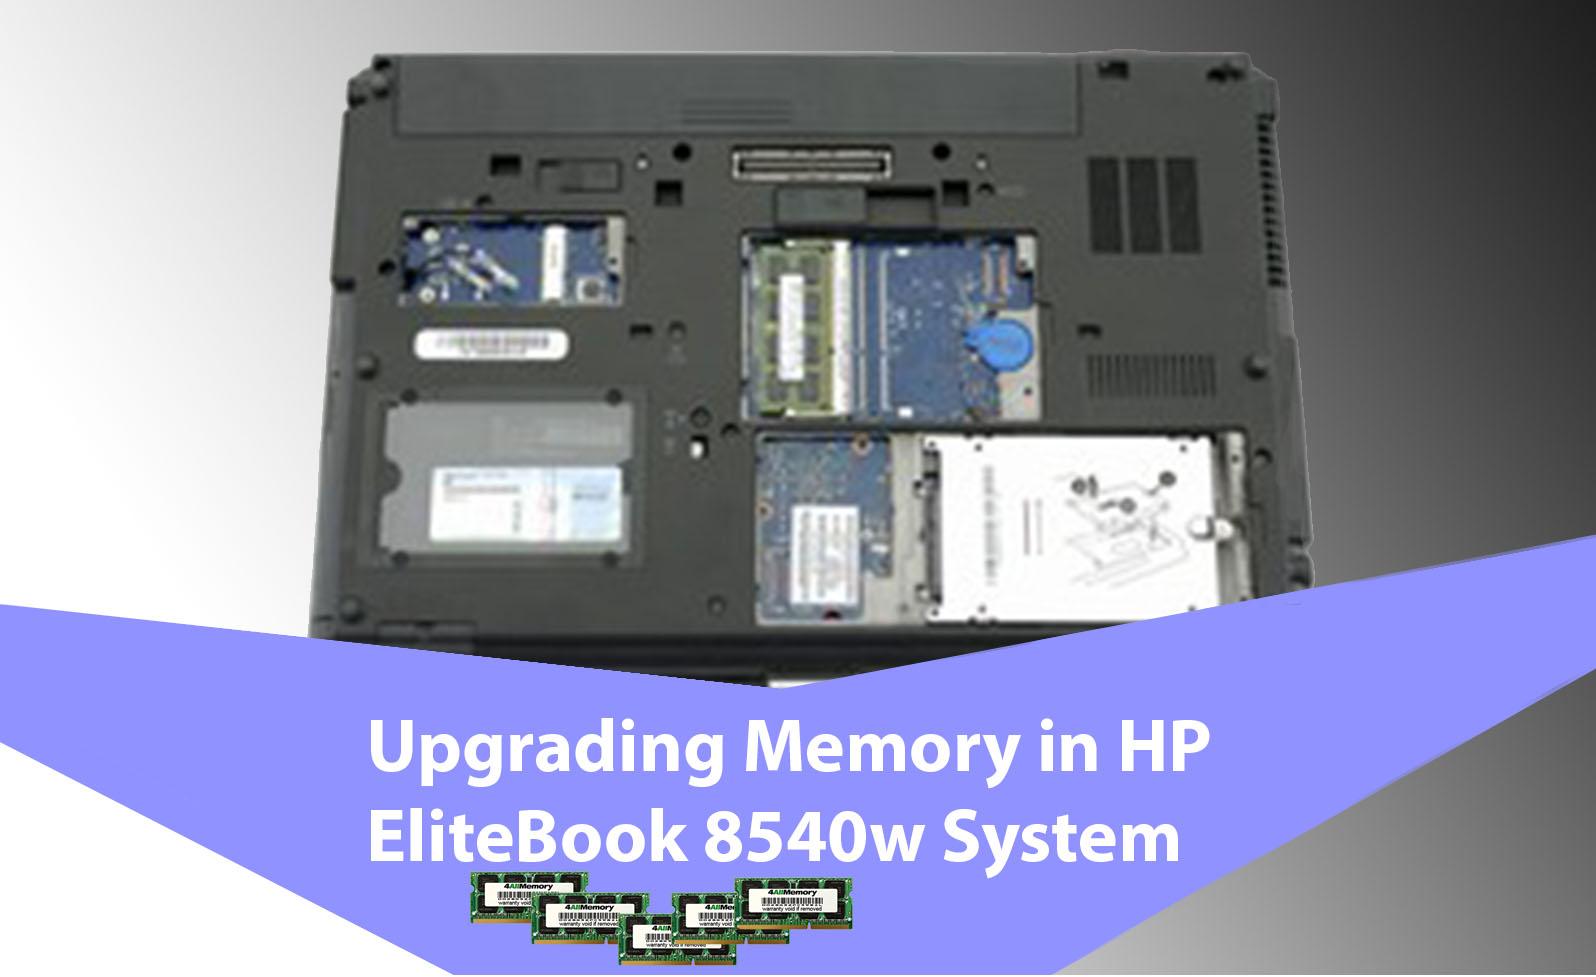 HP EliteBook 8540w system